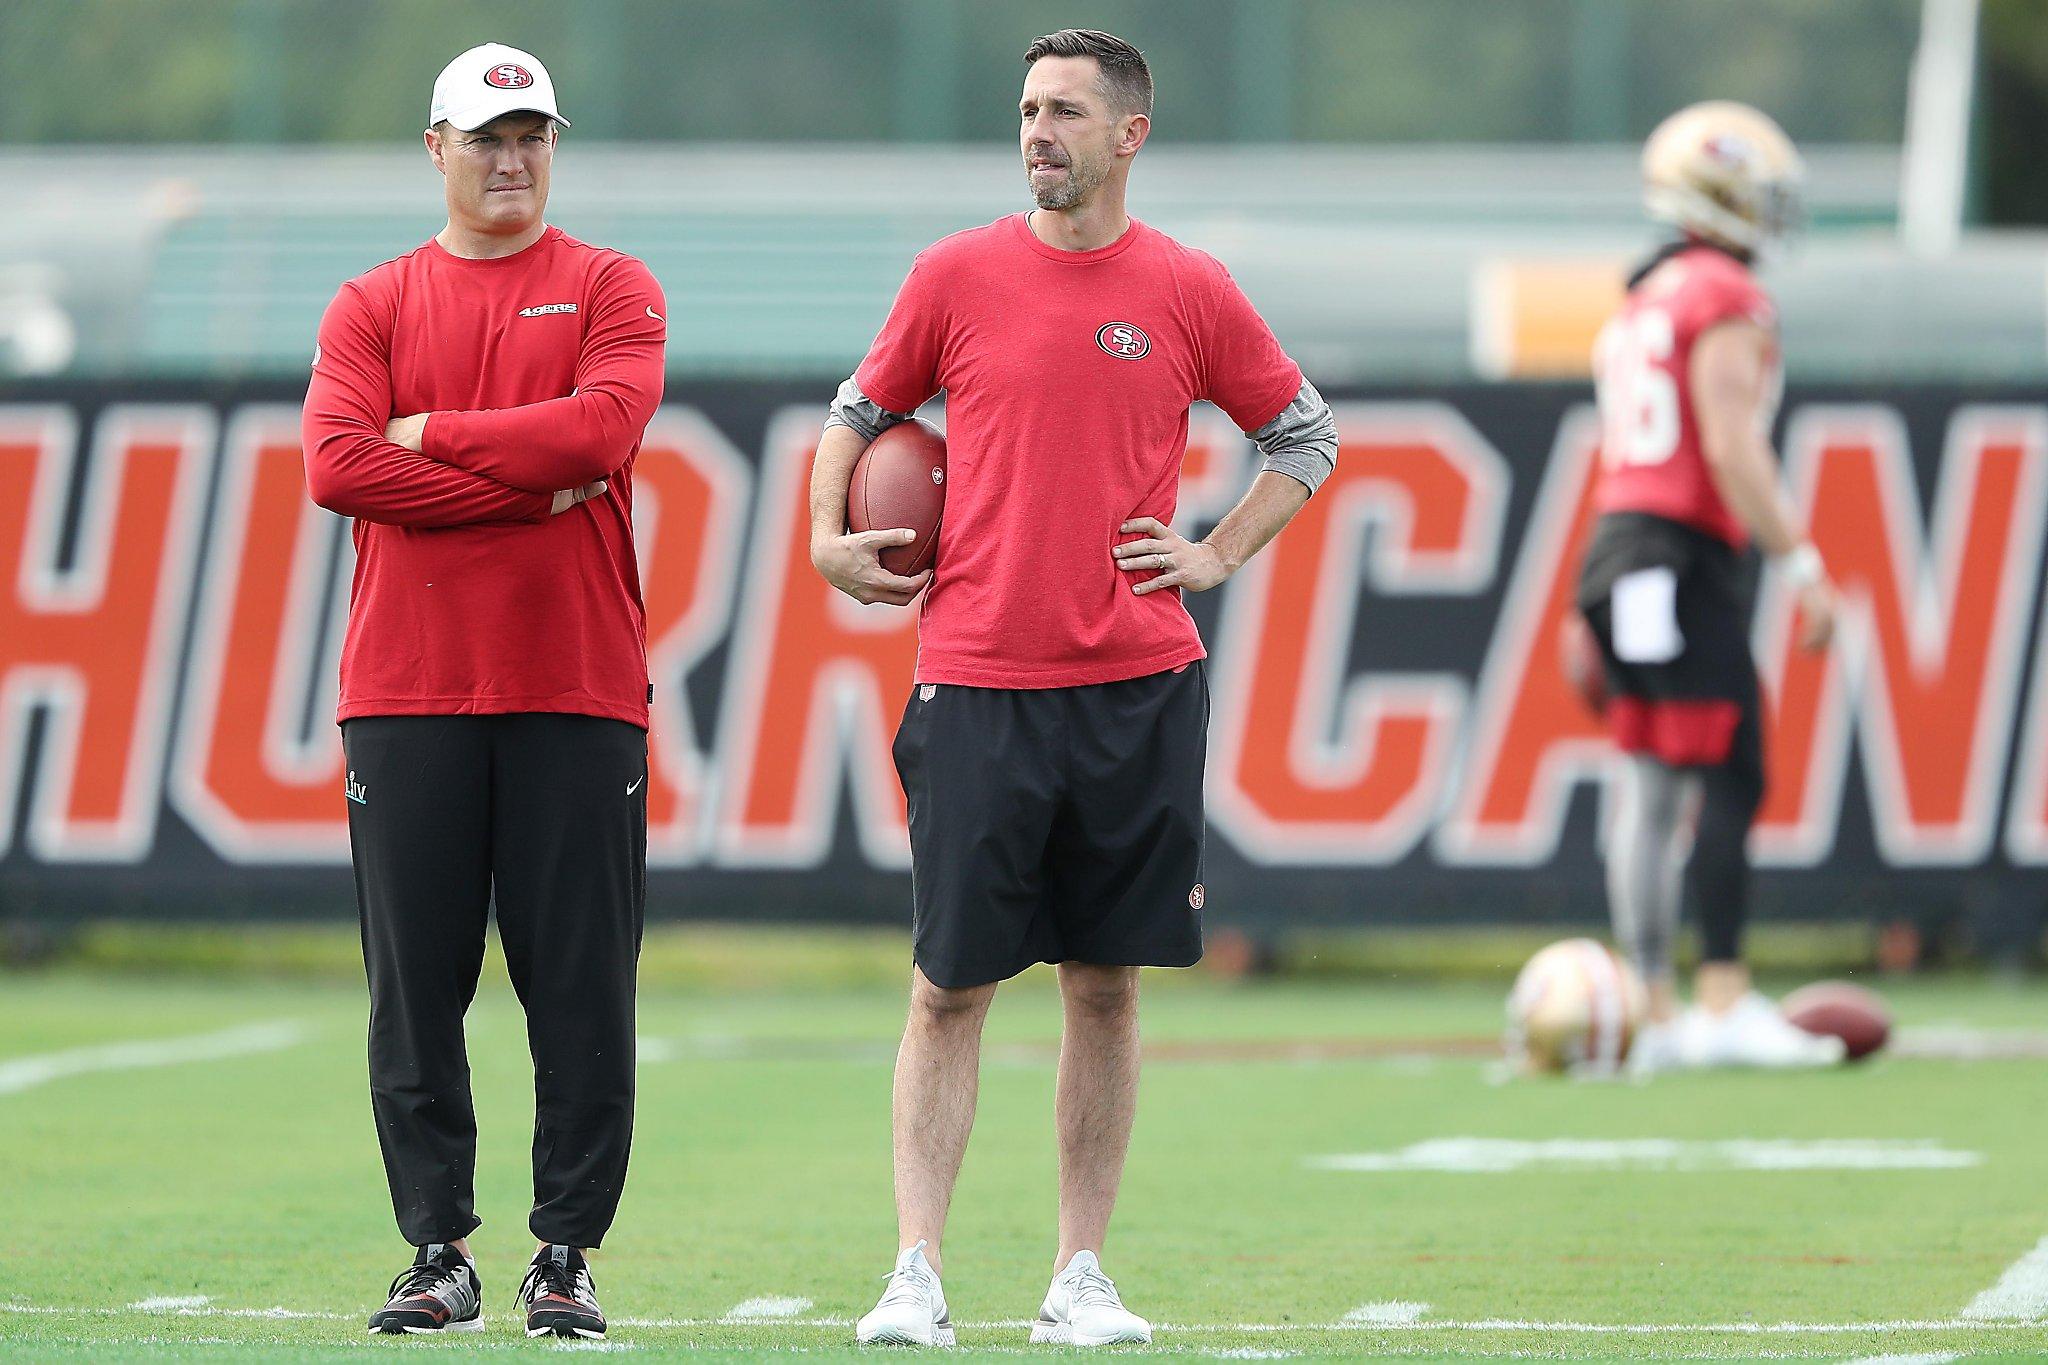 49ers' Kyle Shanahan, John Lynch rewind Super Bowl 'punch in the gut' loss